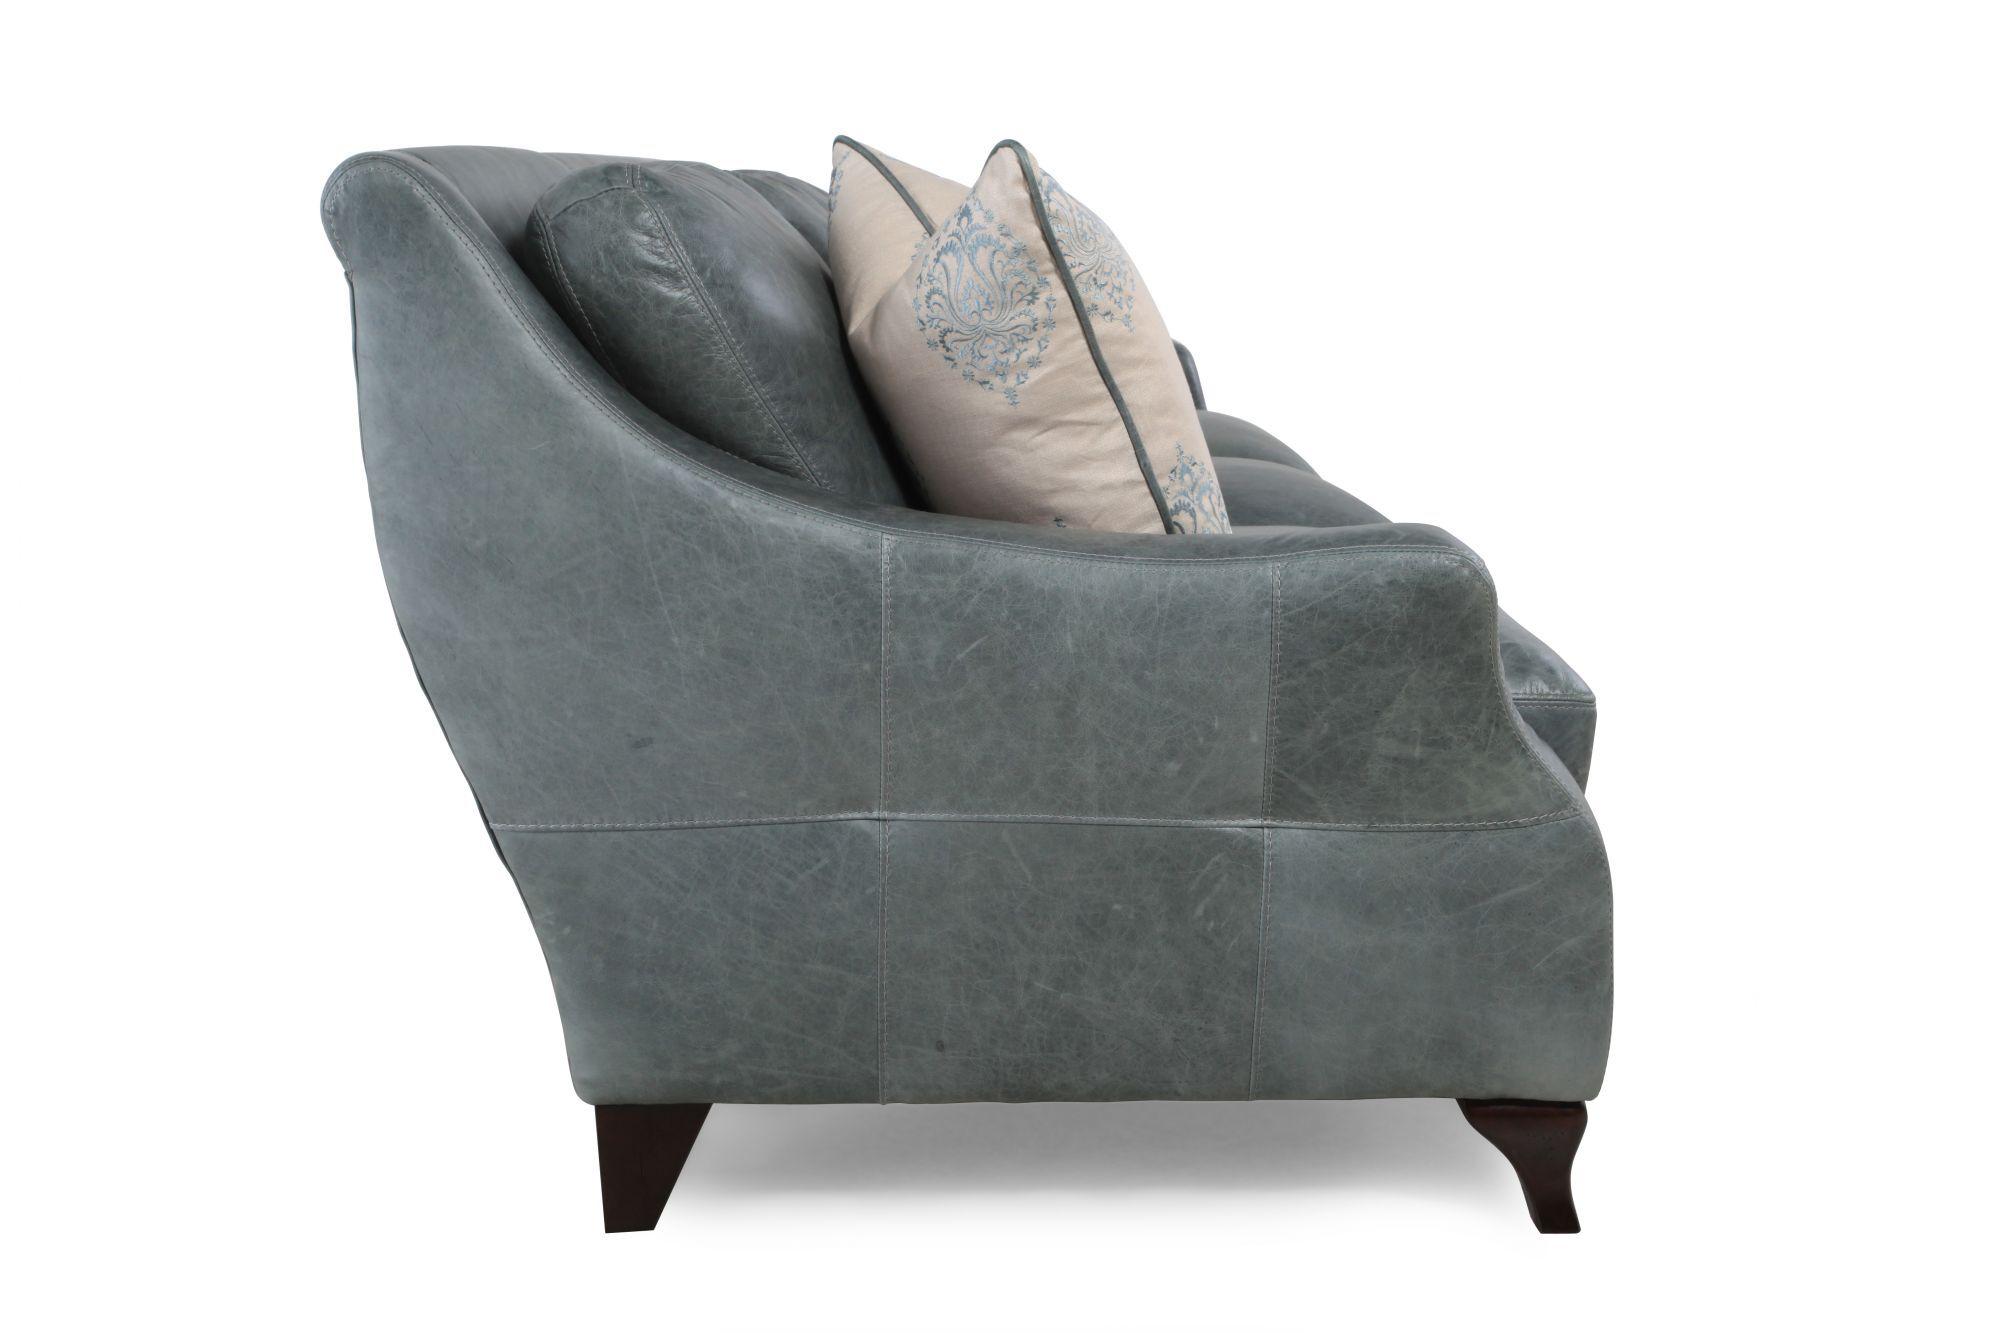 ... Distressed Leather Sofa In Teal. U2039 U203a